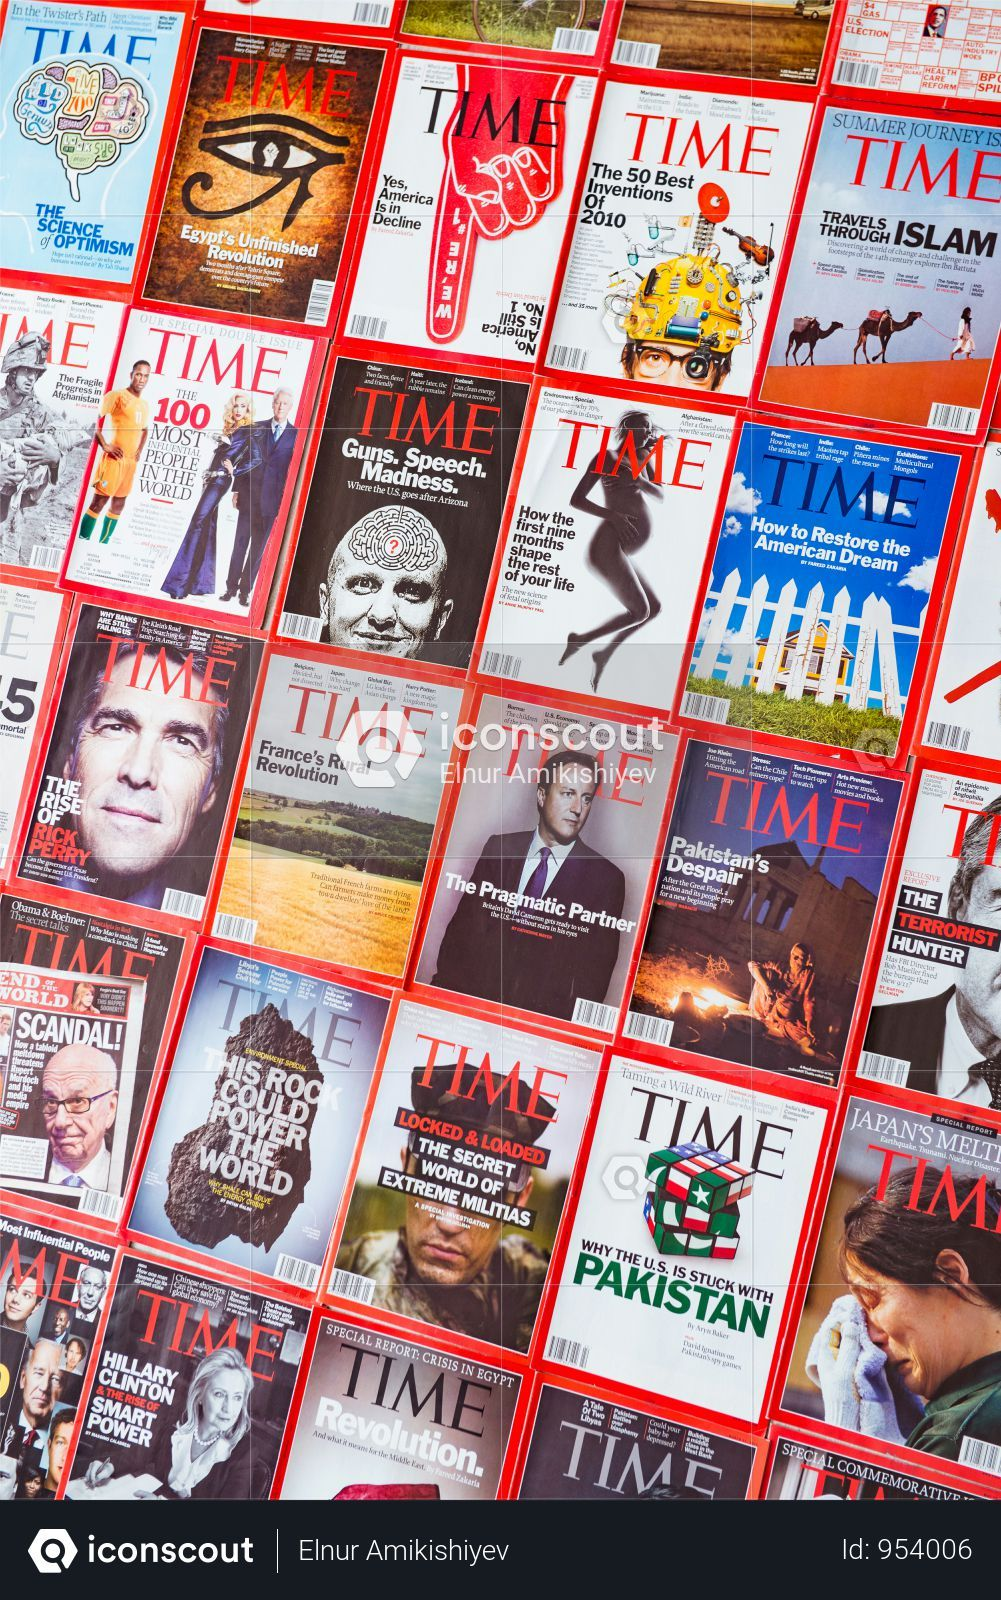 Premium New York Time Magazine Photo Download In Png Jpg Format Time Magazine Photo New York